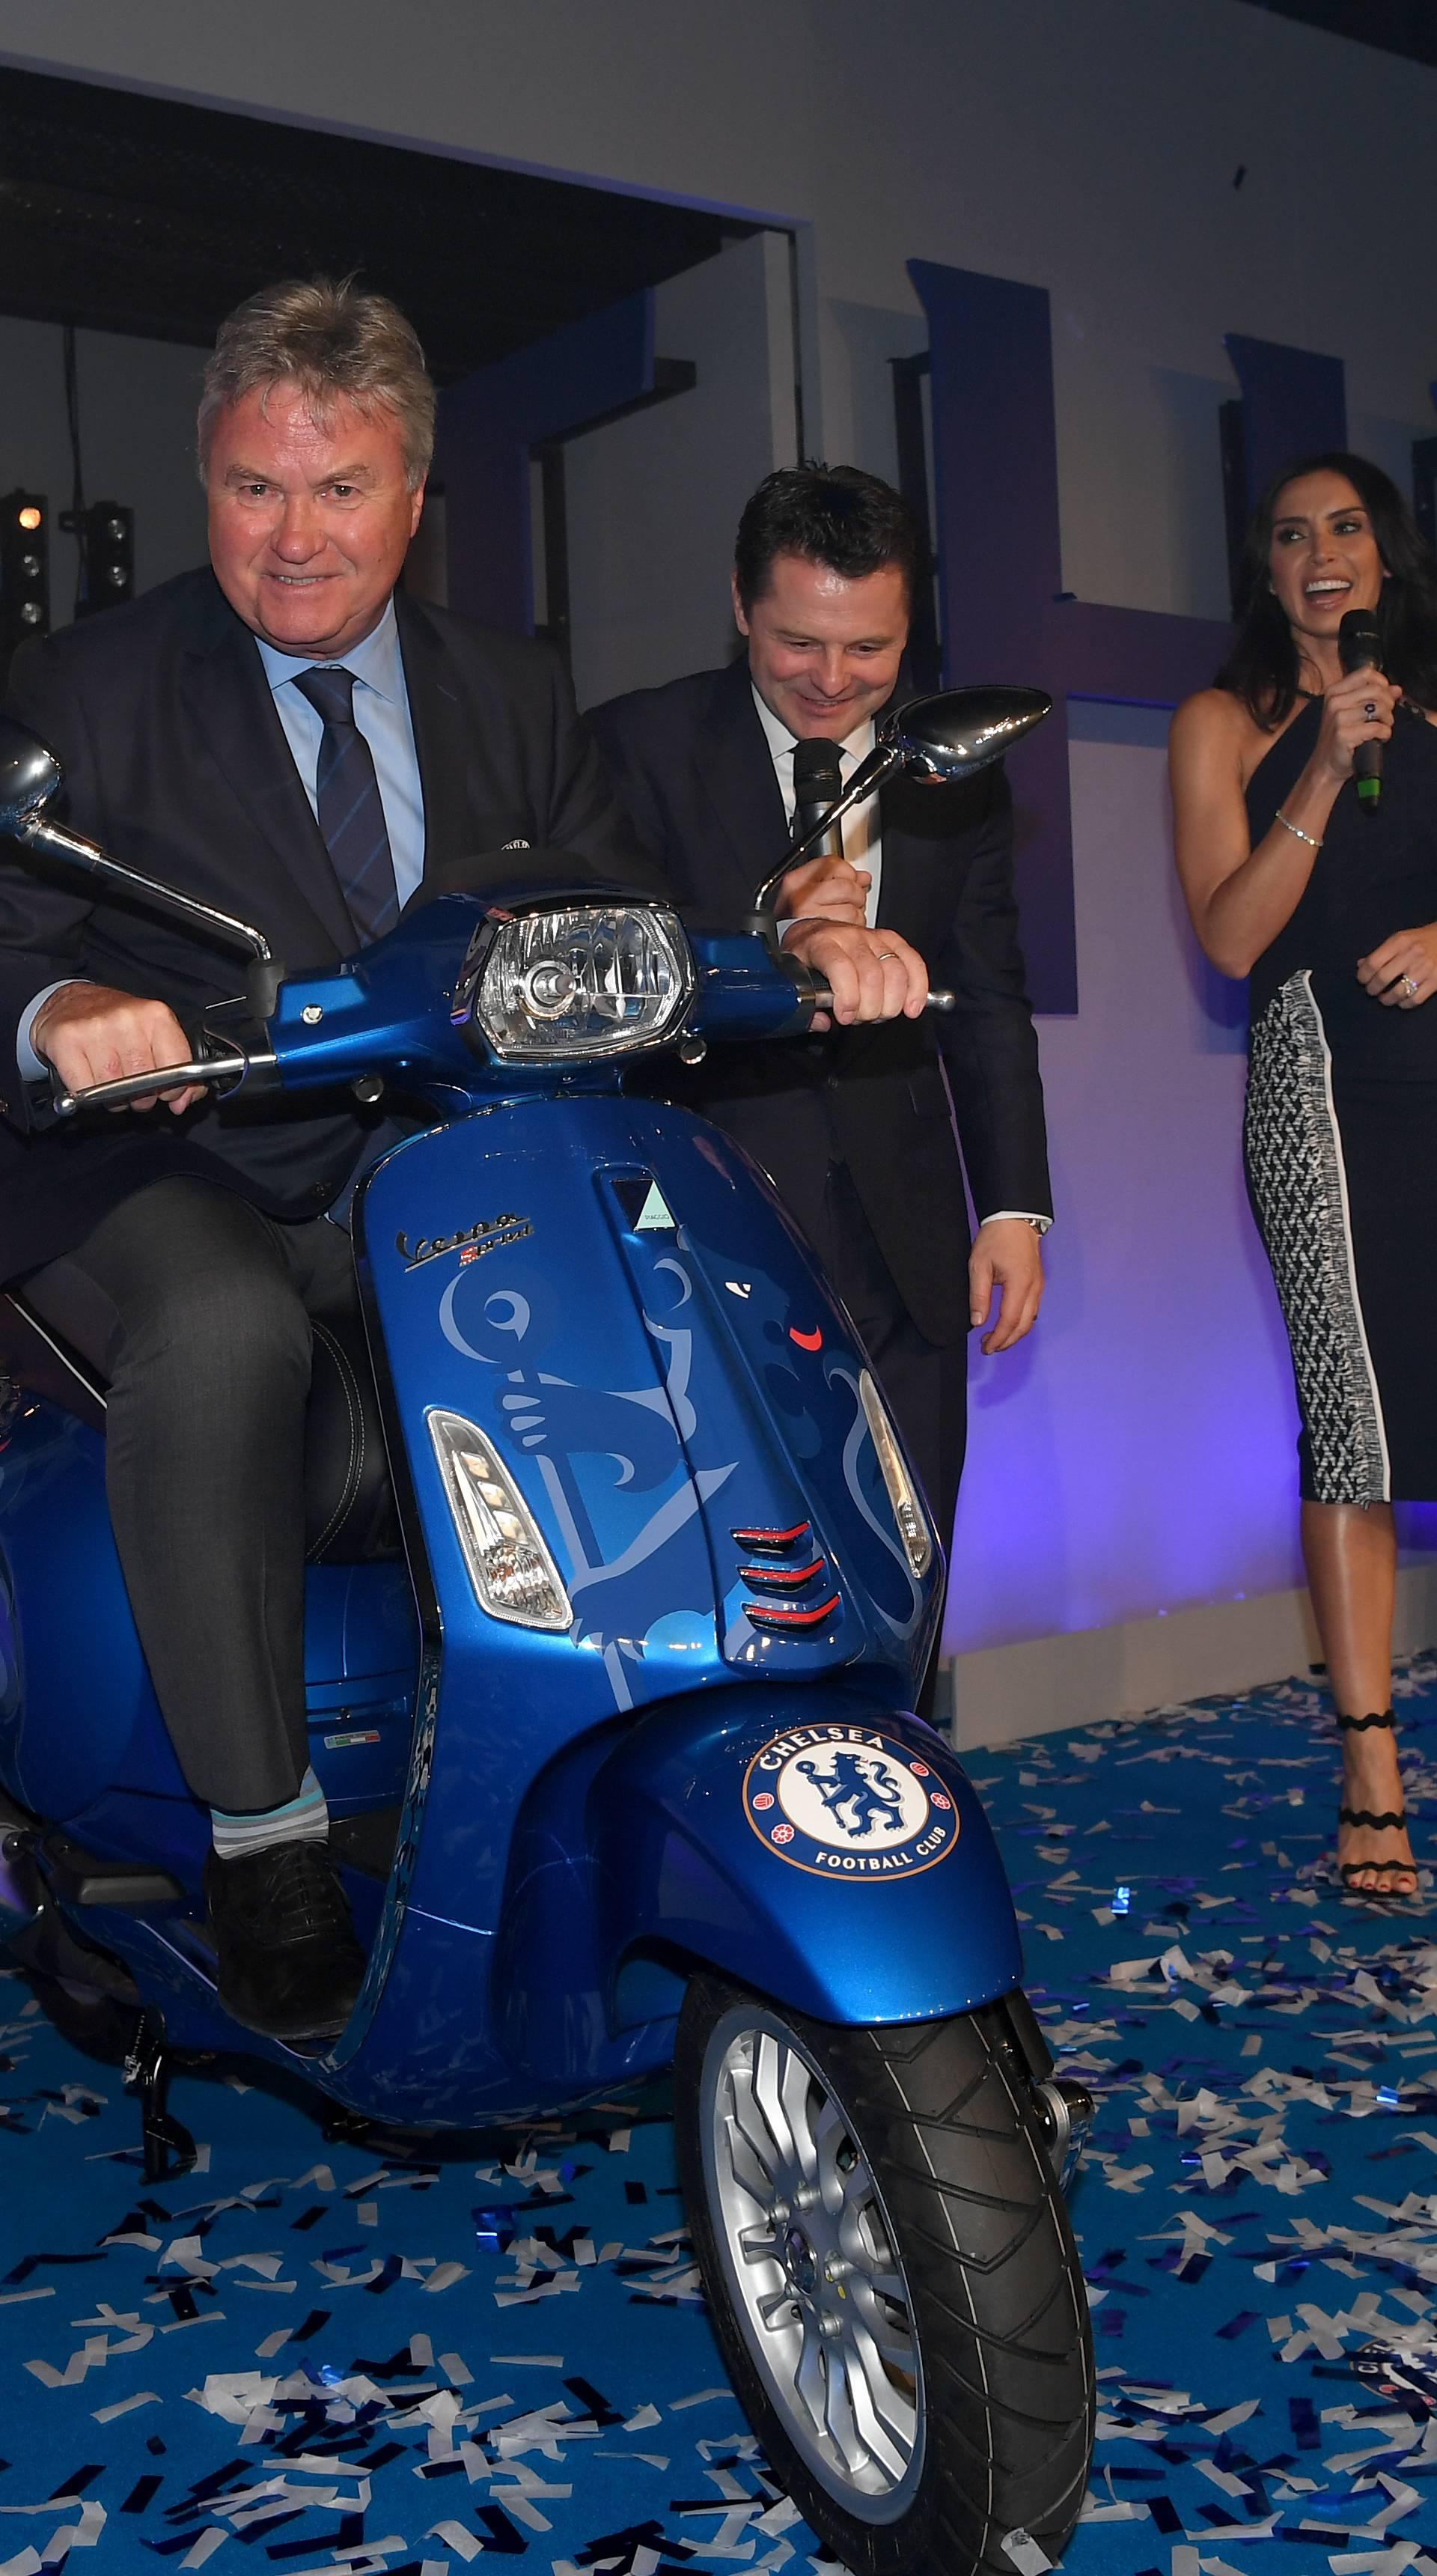 Chelsea FC 2015/16 End of Season Awards - Stamford Bridge